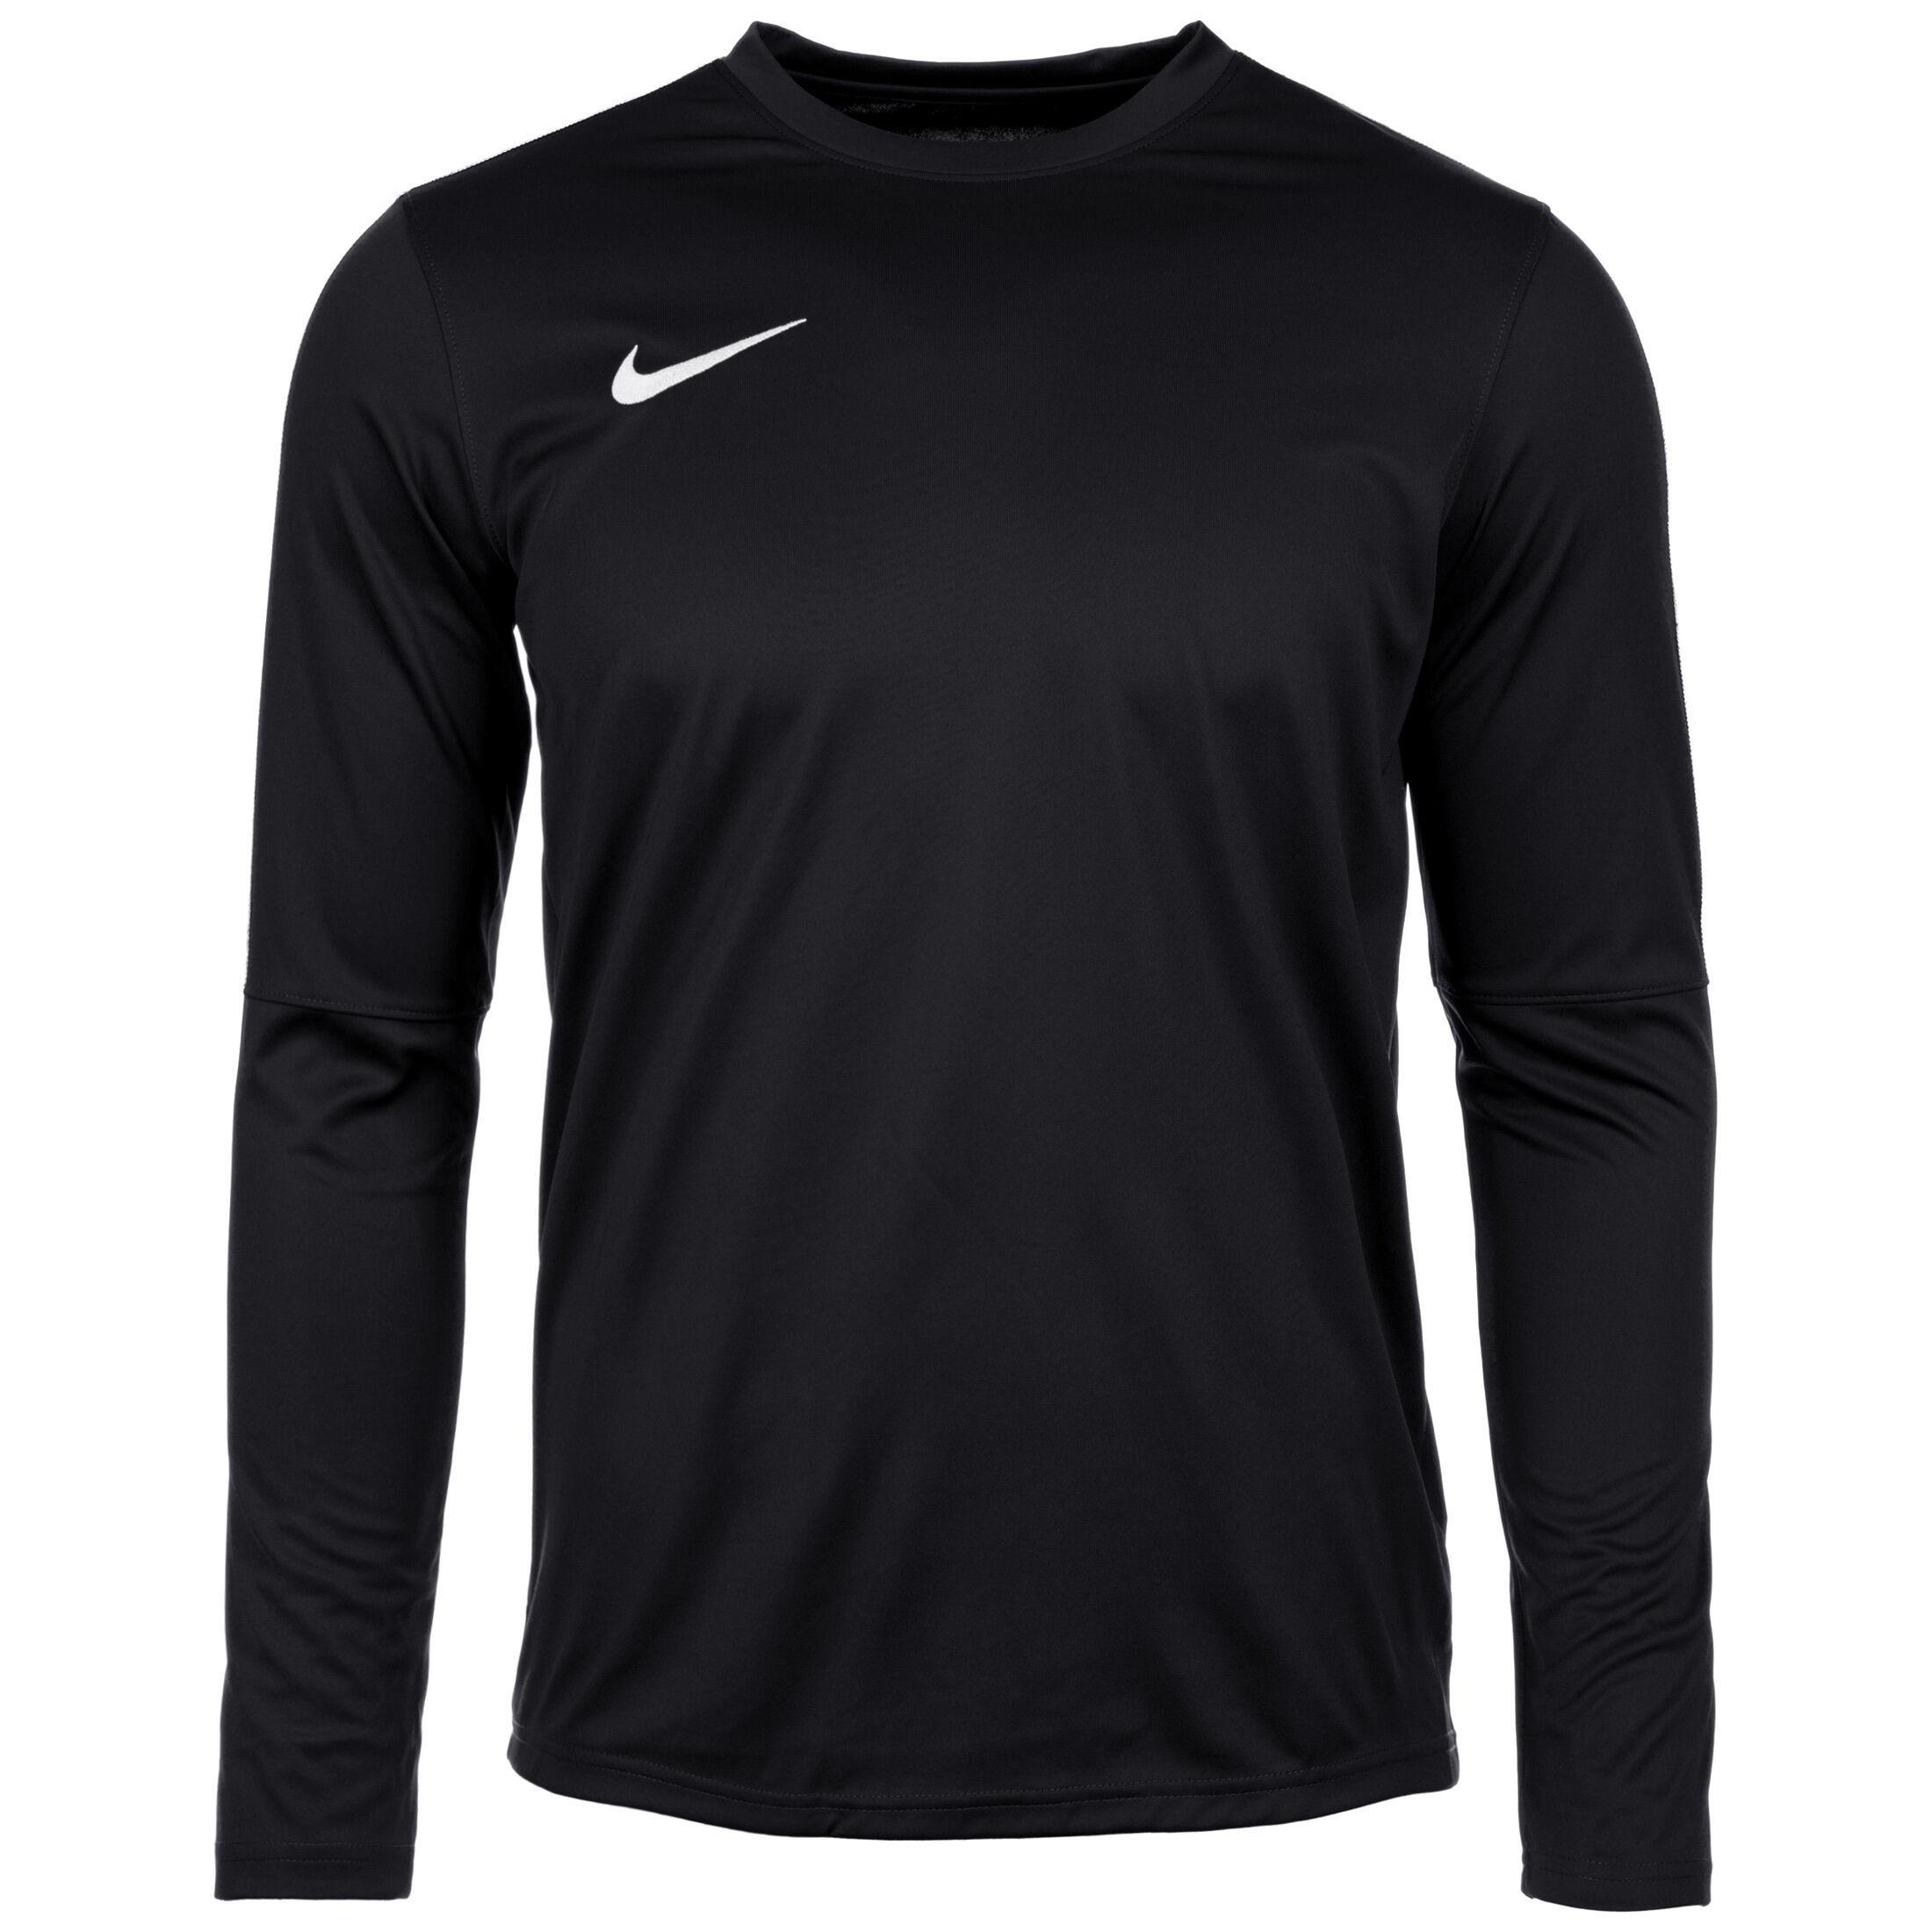 Nike Performance Dry Park 18 Longsleeve Herren rot weiß